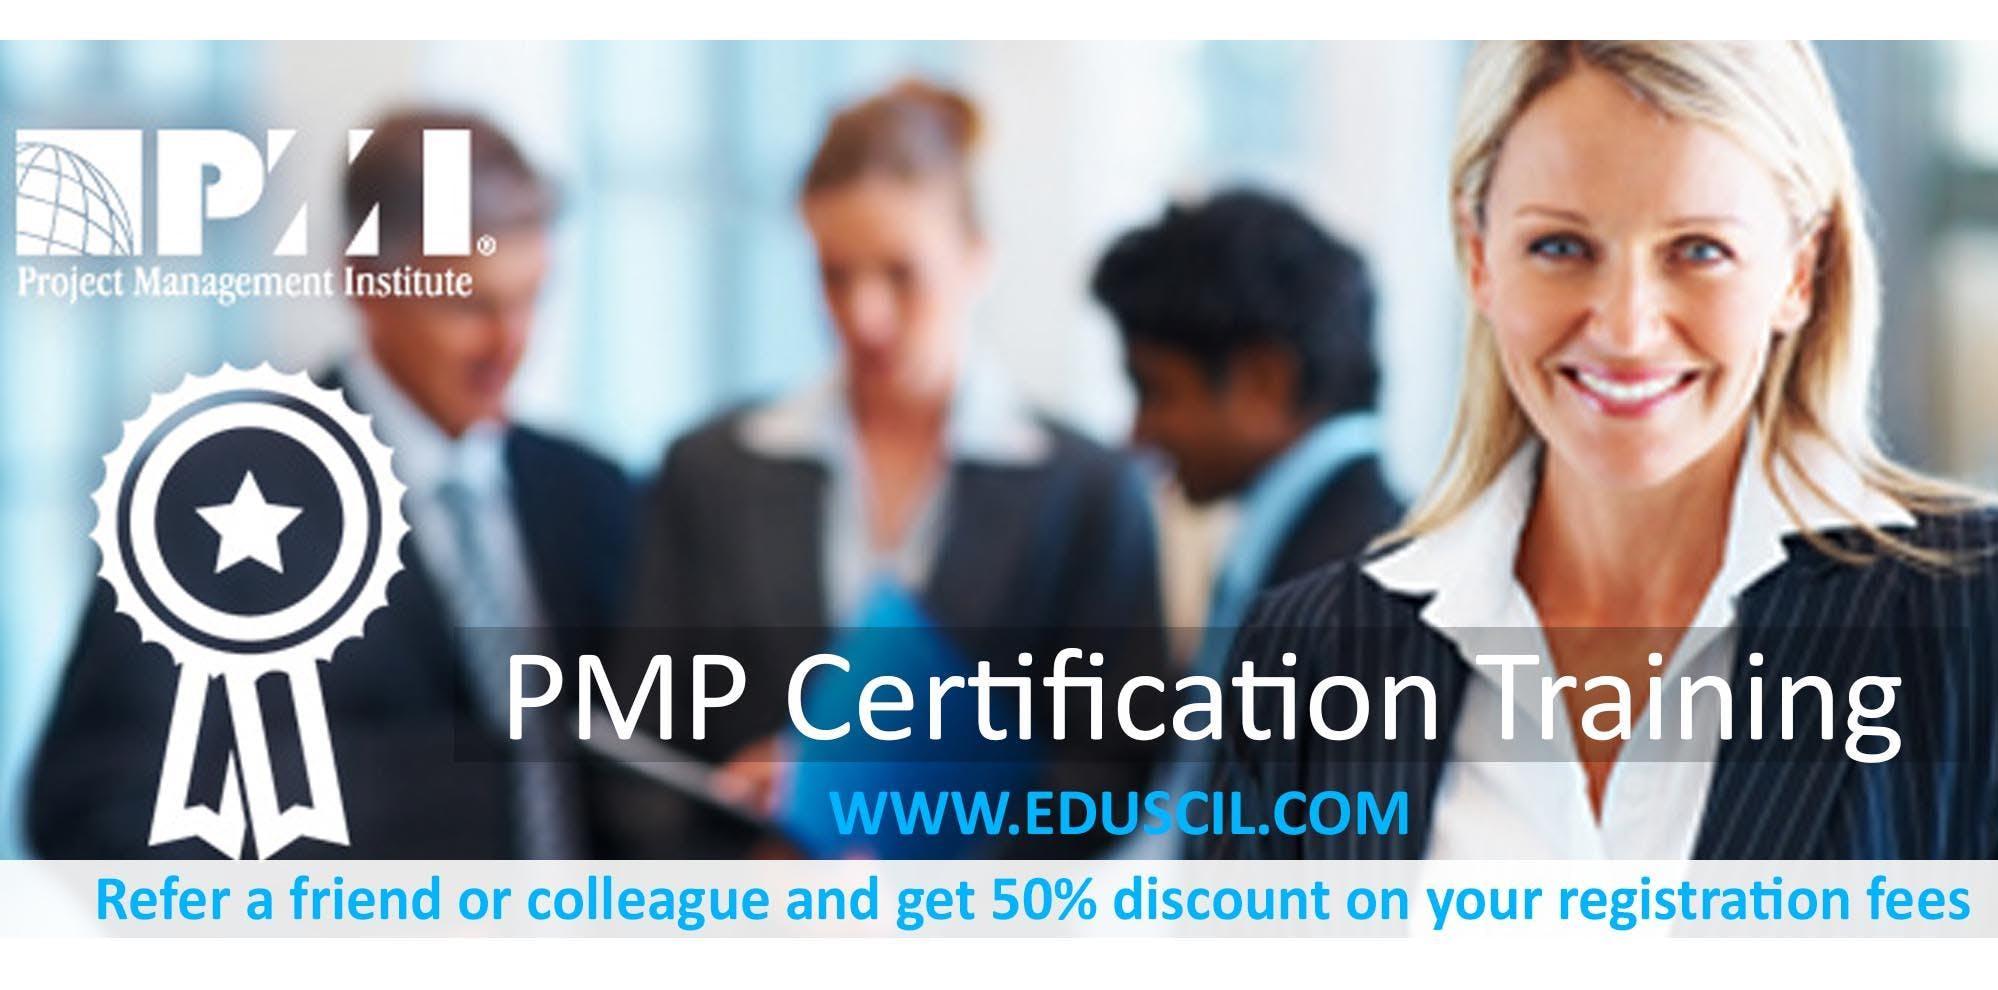 4 Days PMP Training Workshop at Birmingham, A